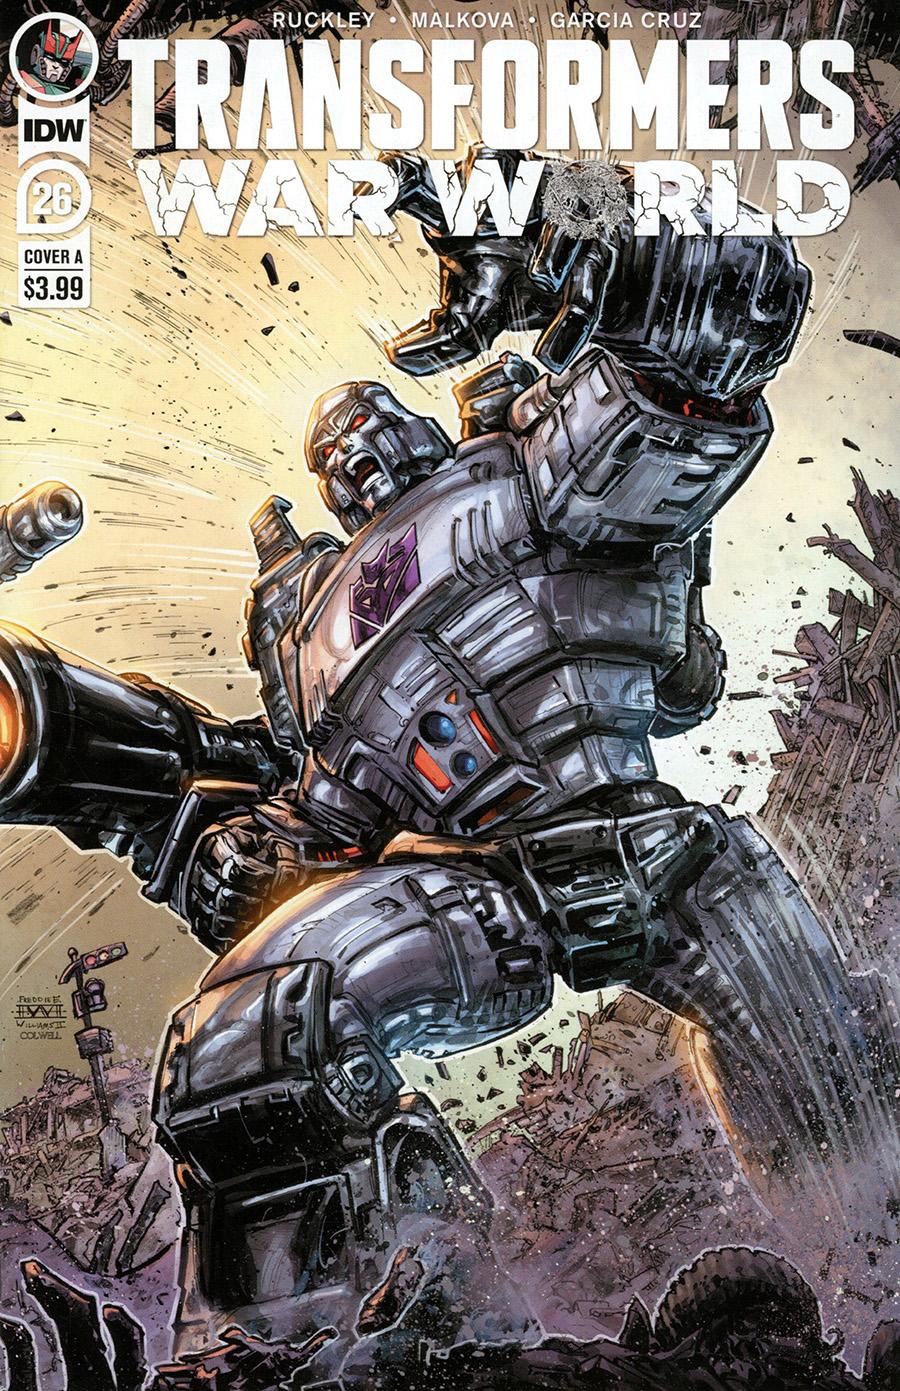 Transformers Vol 4 #26 Cover A Regular Freddie E Williams II Cover